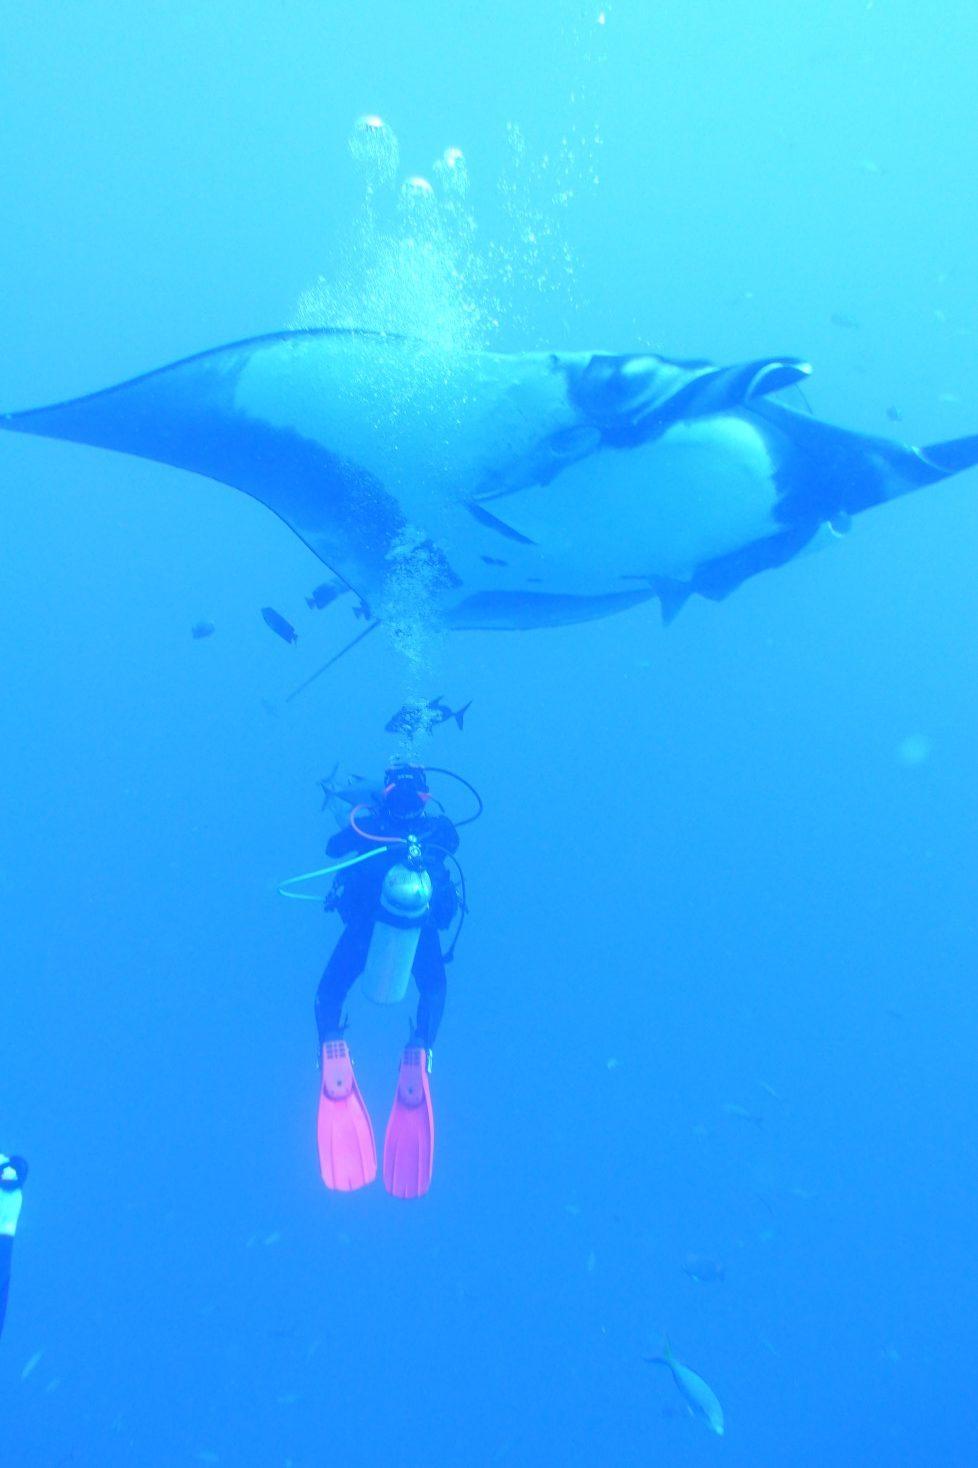 giant manta dwarfs diver observing from below